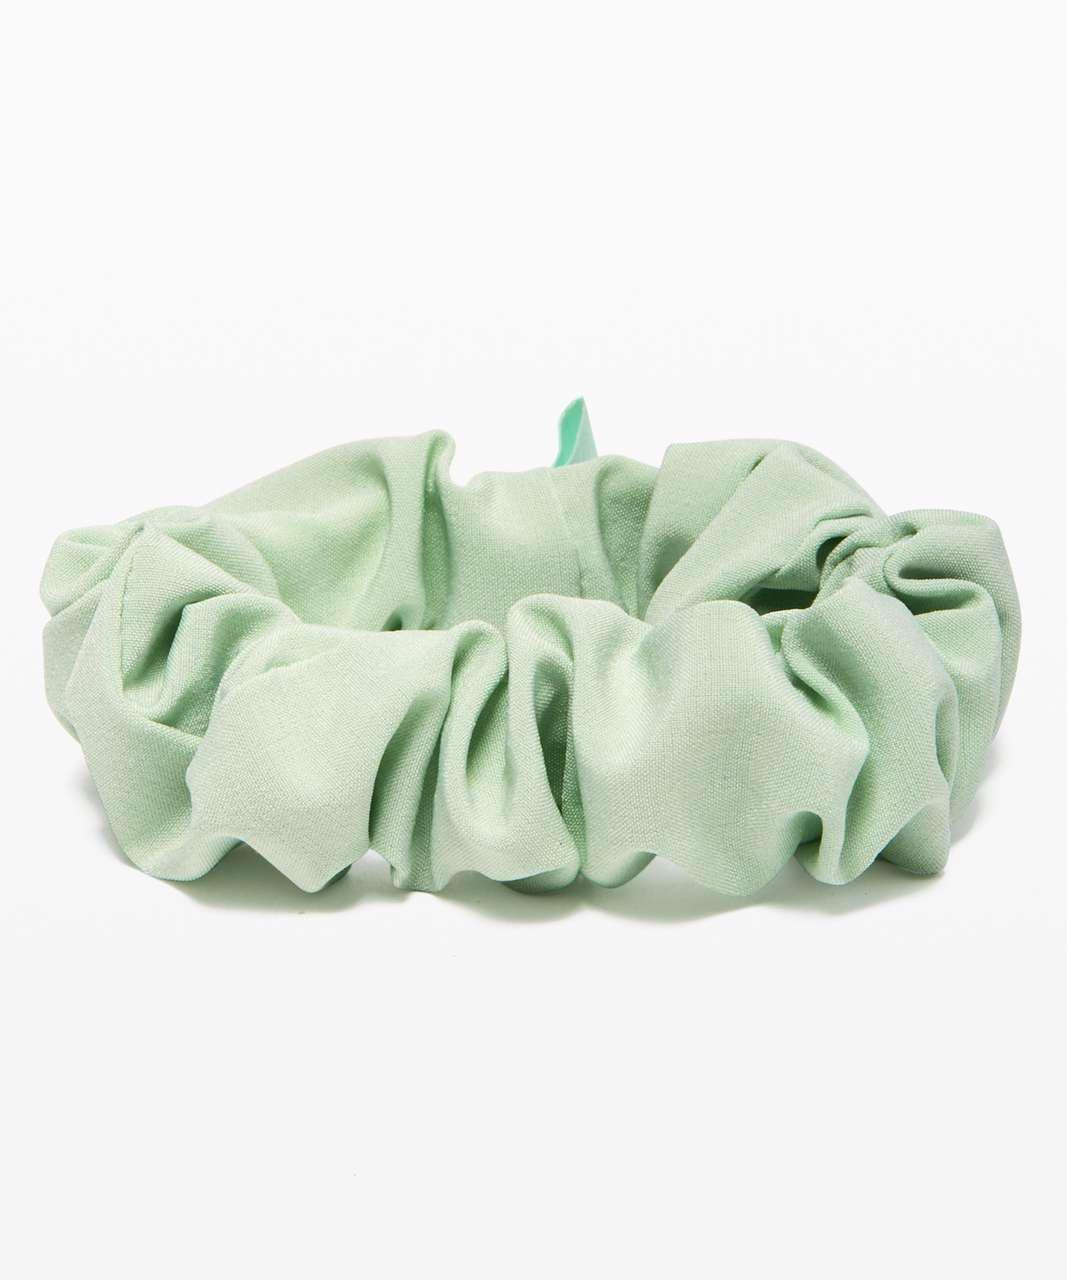 Lululemon Uplifting Scrunchie - Mystic Mint - lulu fanatics